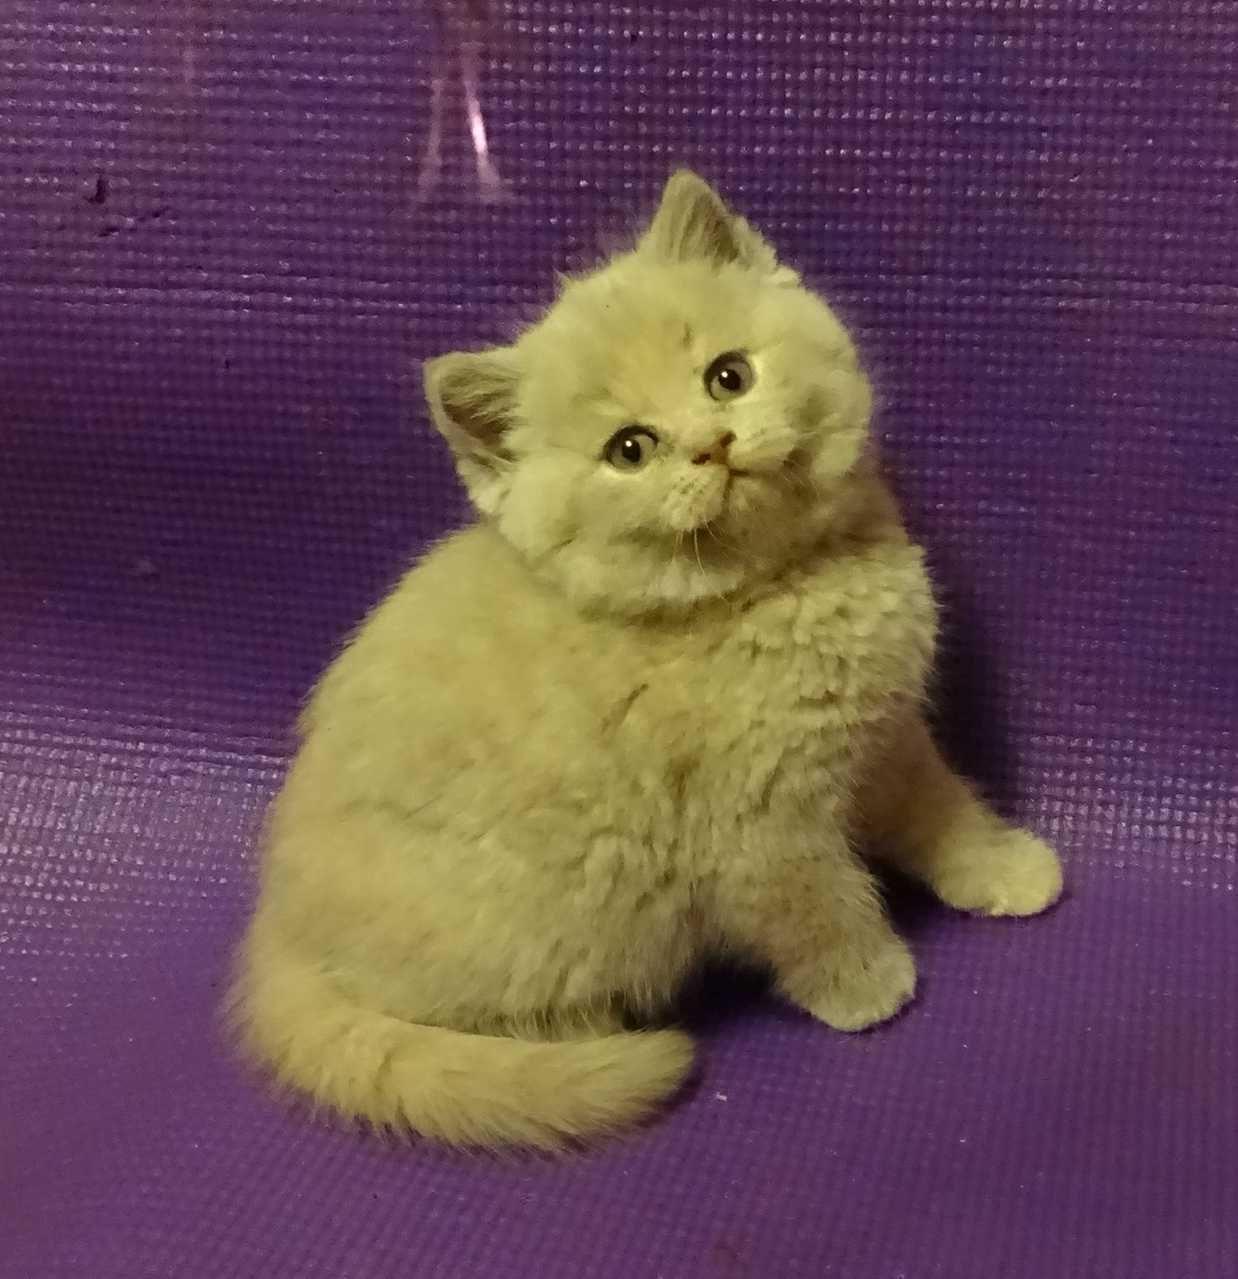 Lilac Cream British Shorthair Kitten British Shorthair Kittens Scottish Fold Kittens British Shorthair